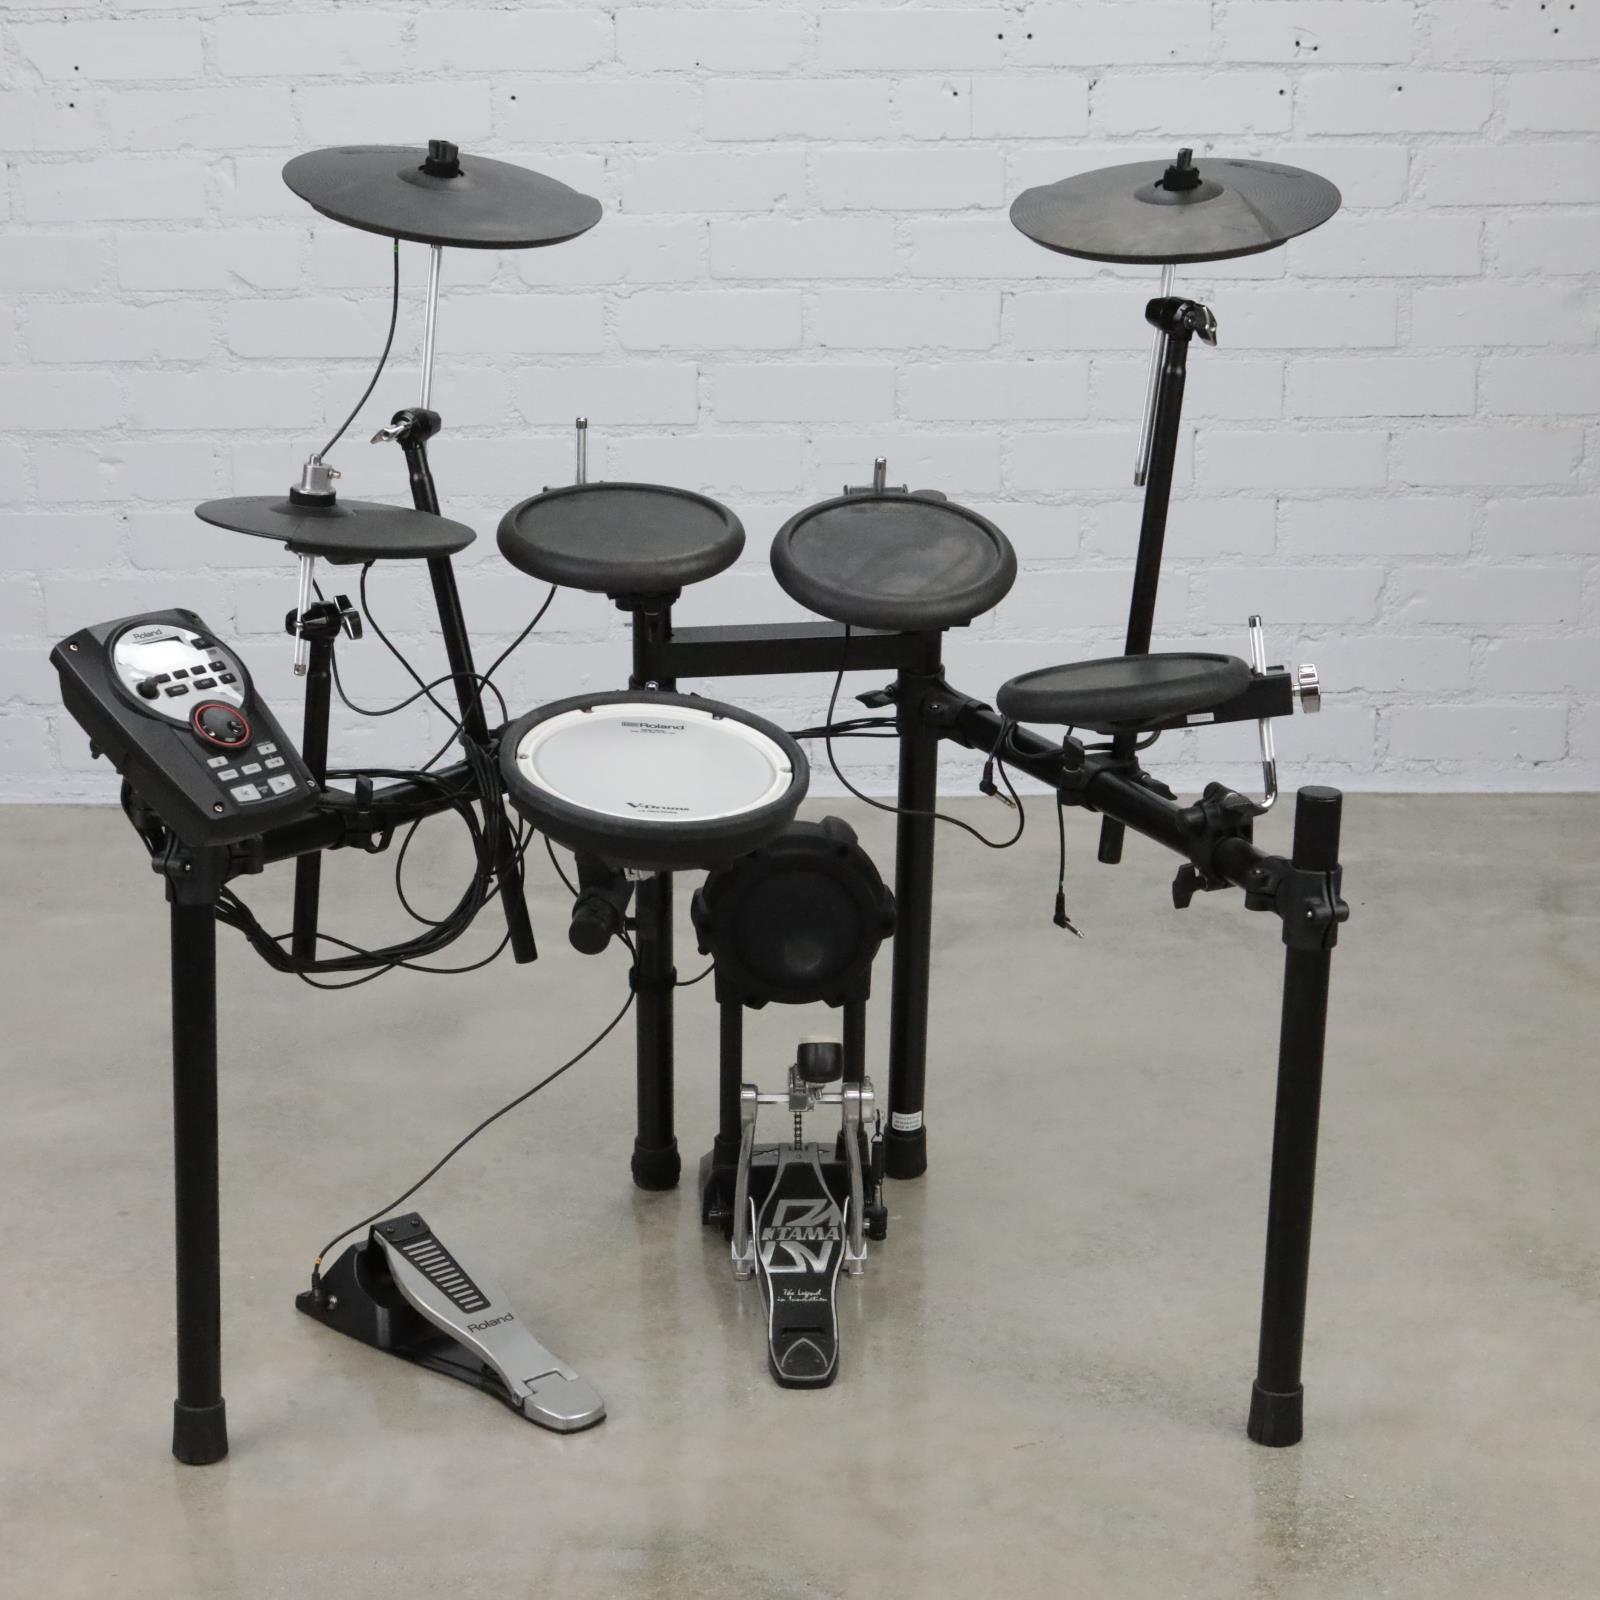 Roland V-Drums TD-11 Sound Module Electronic Drum Kit Drums Pads #39986